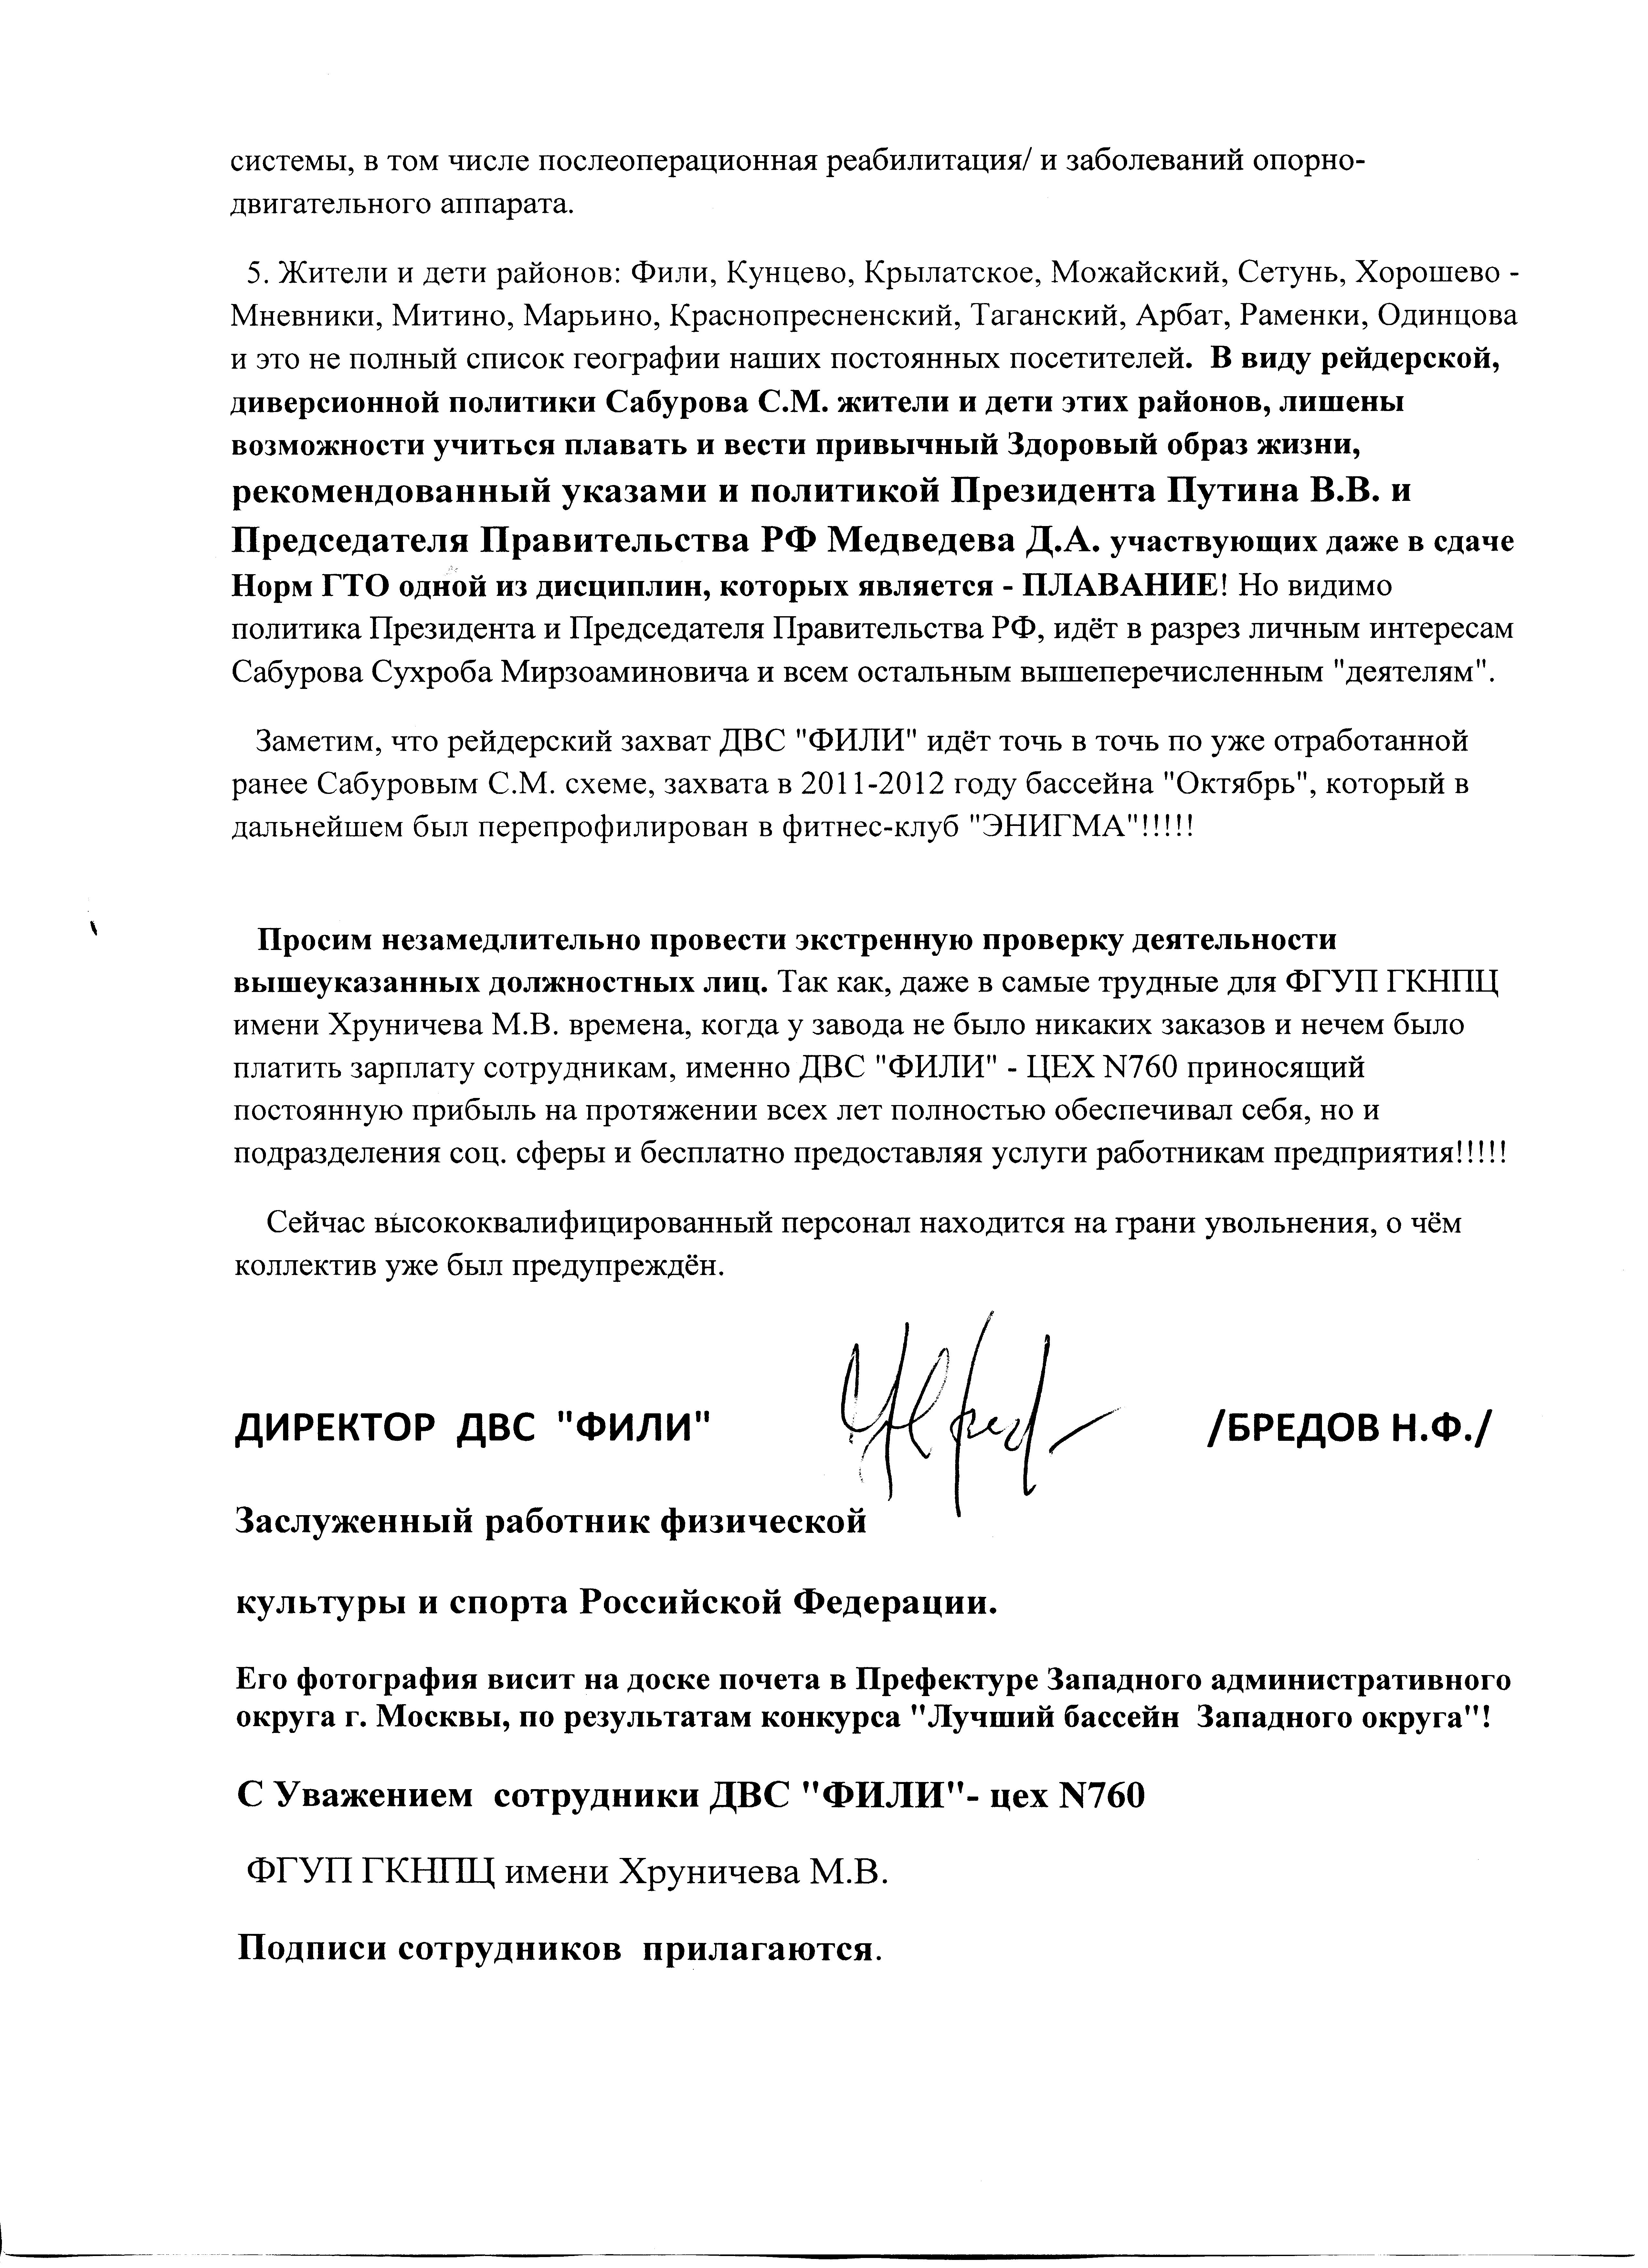 http://ic.pics.livejournal.com/t_kasatkina/51460547/19145/19145_original.jpg